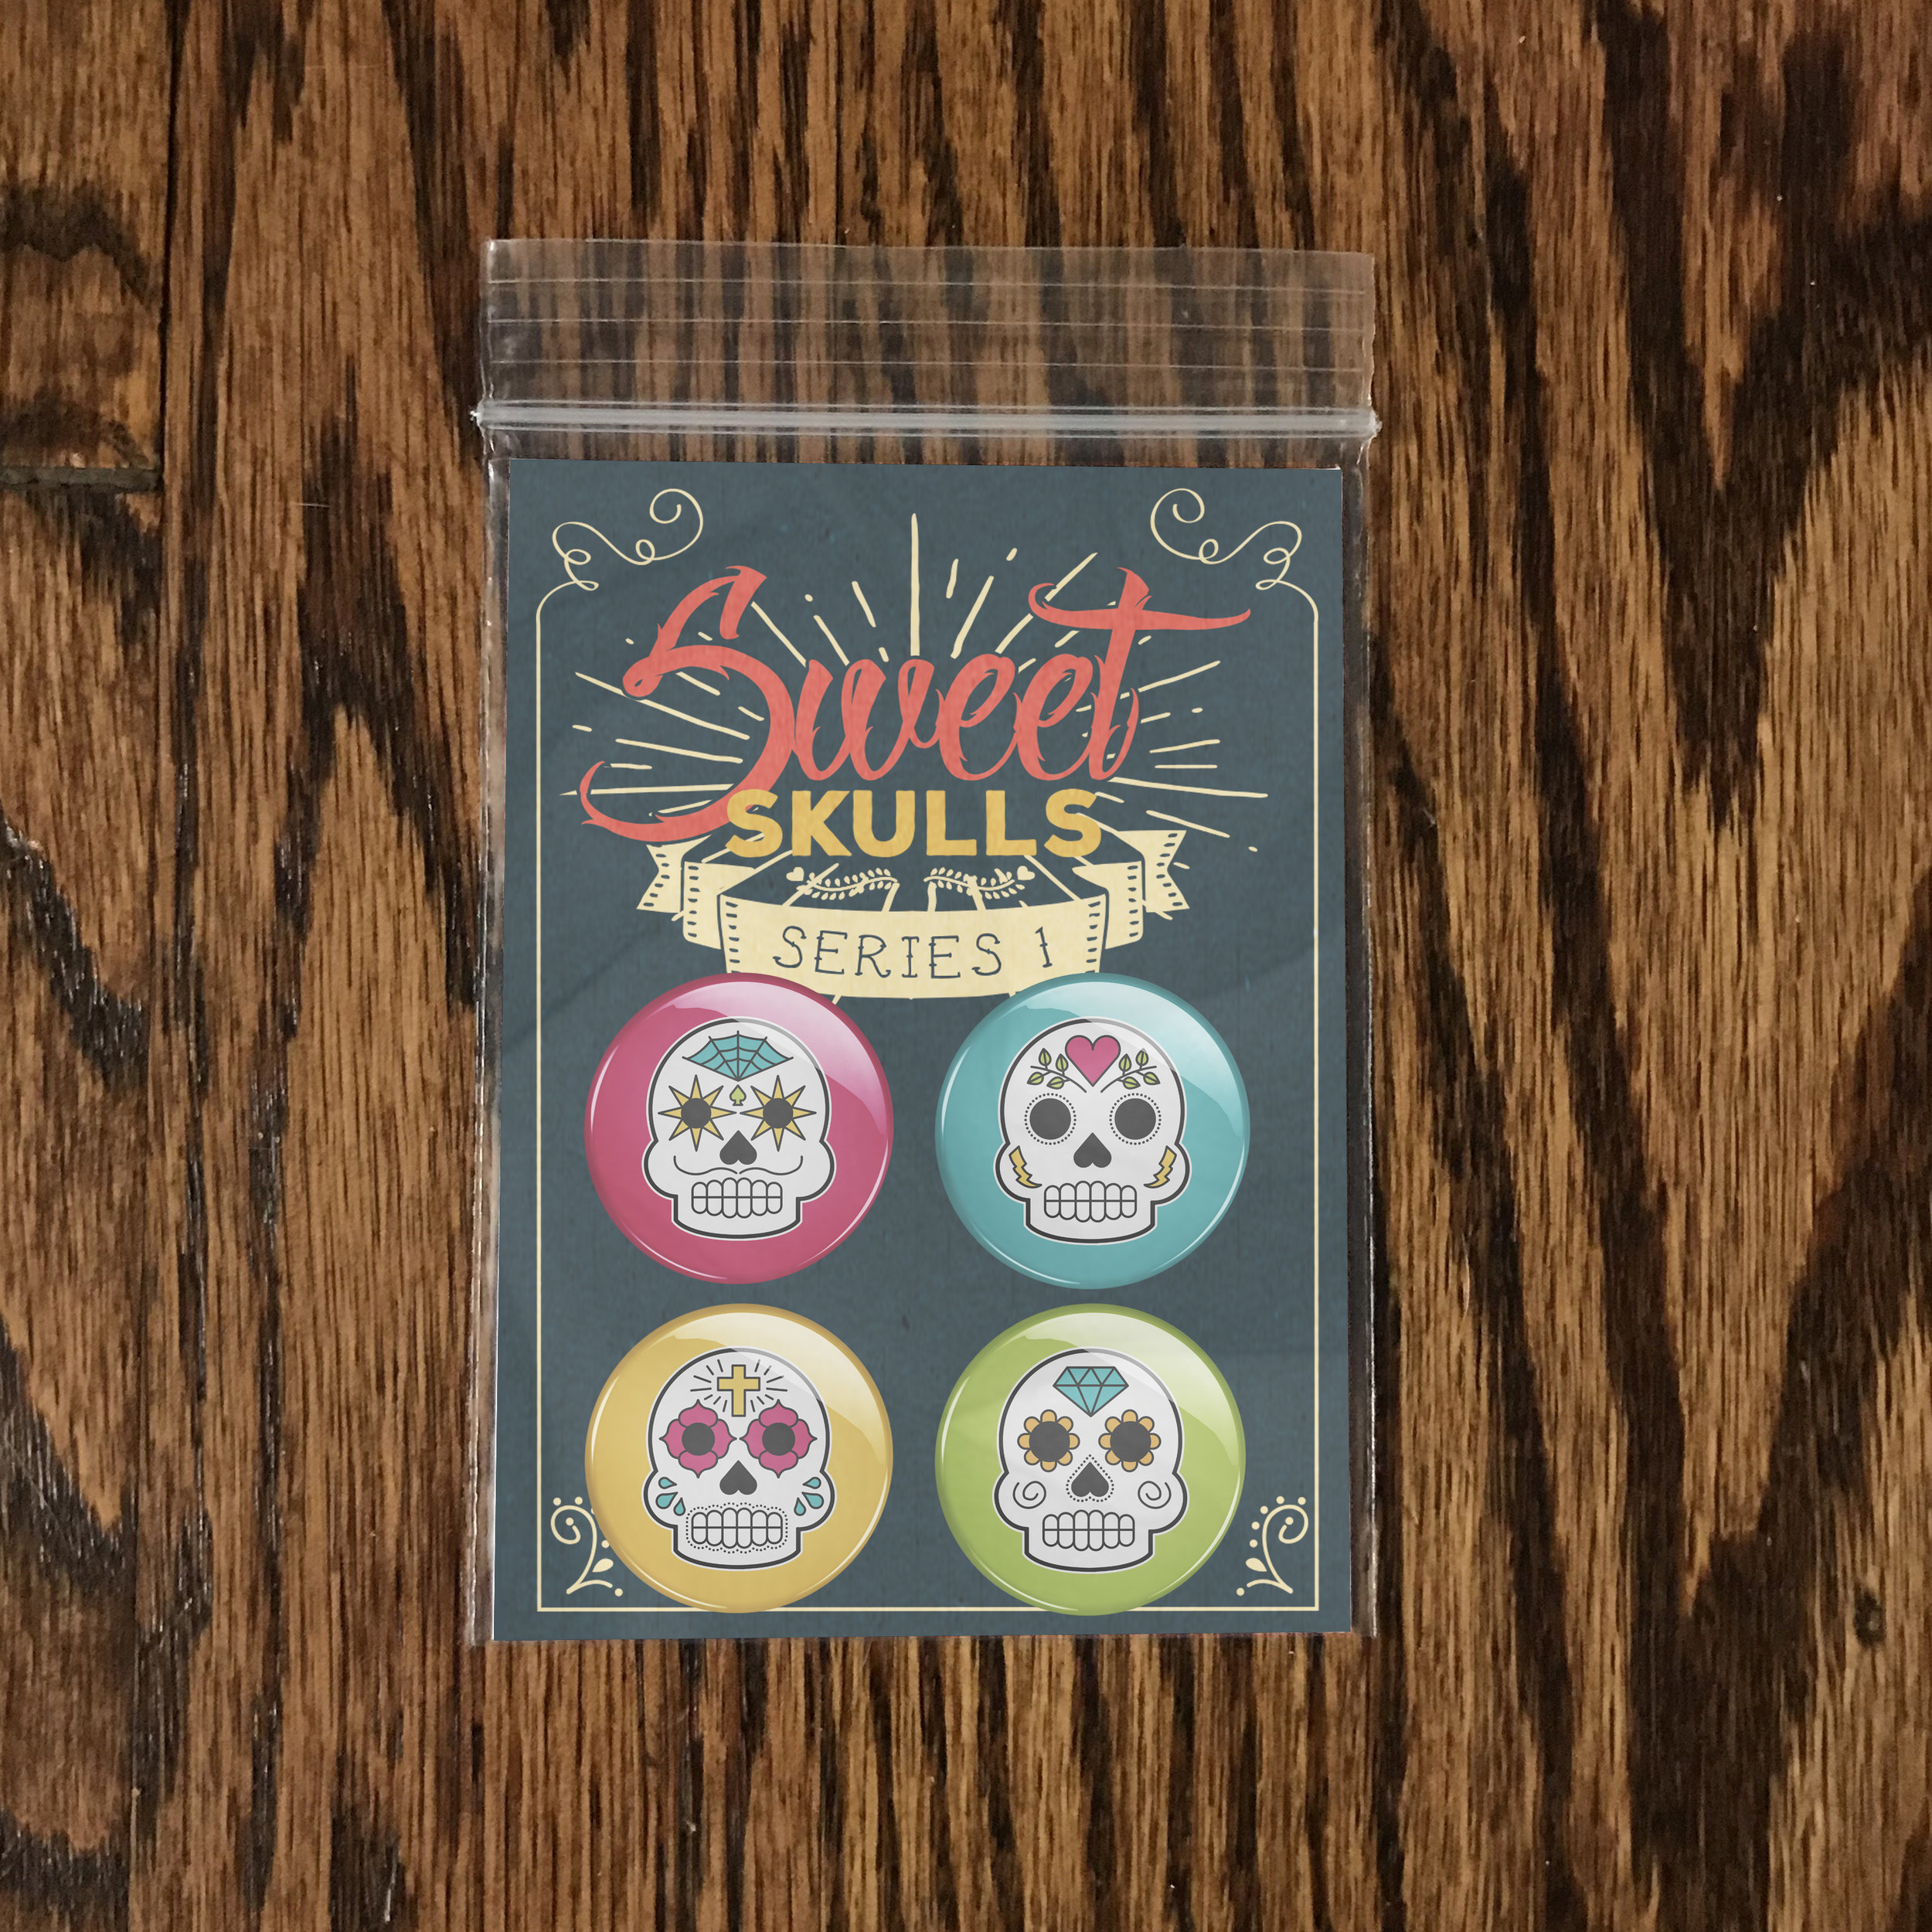 SweetSkulls.jpg